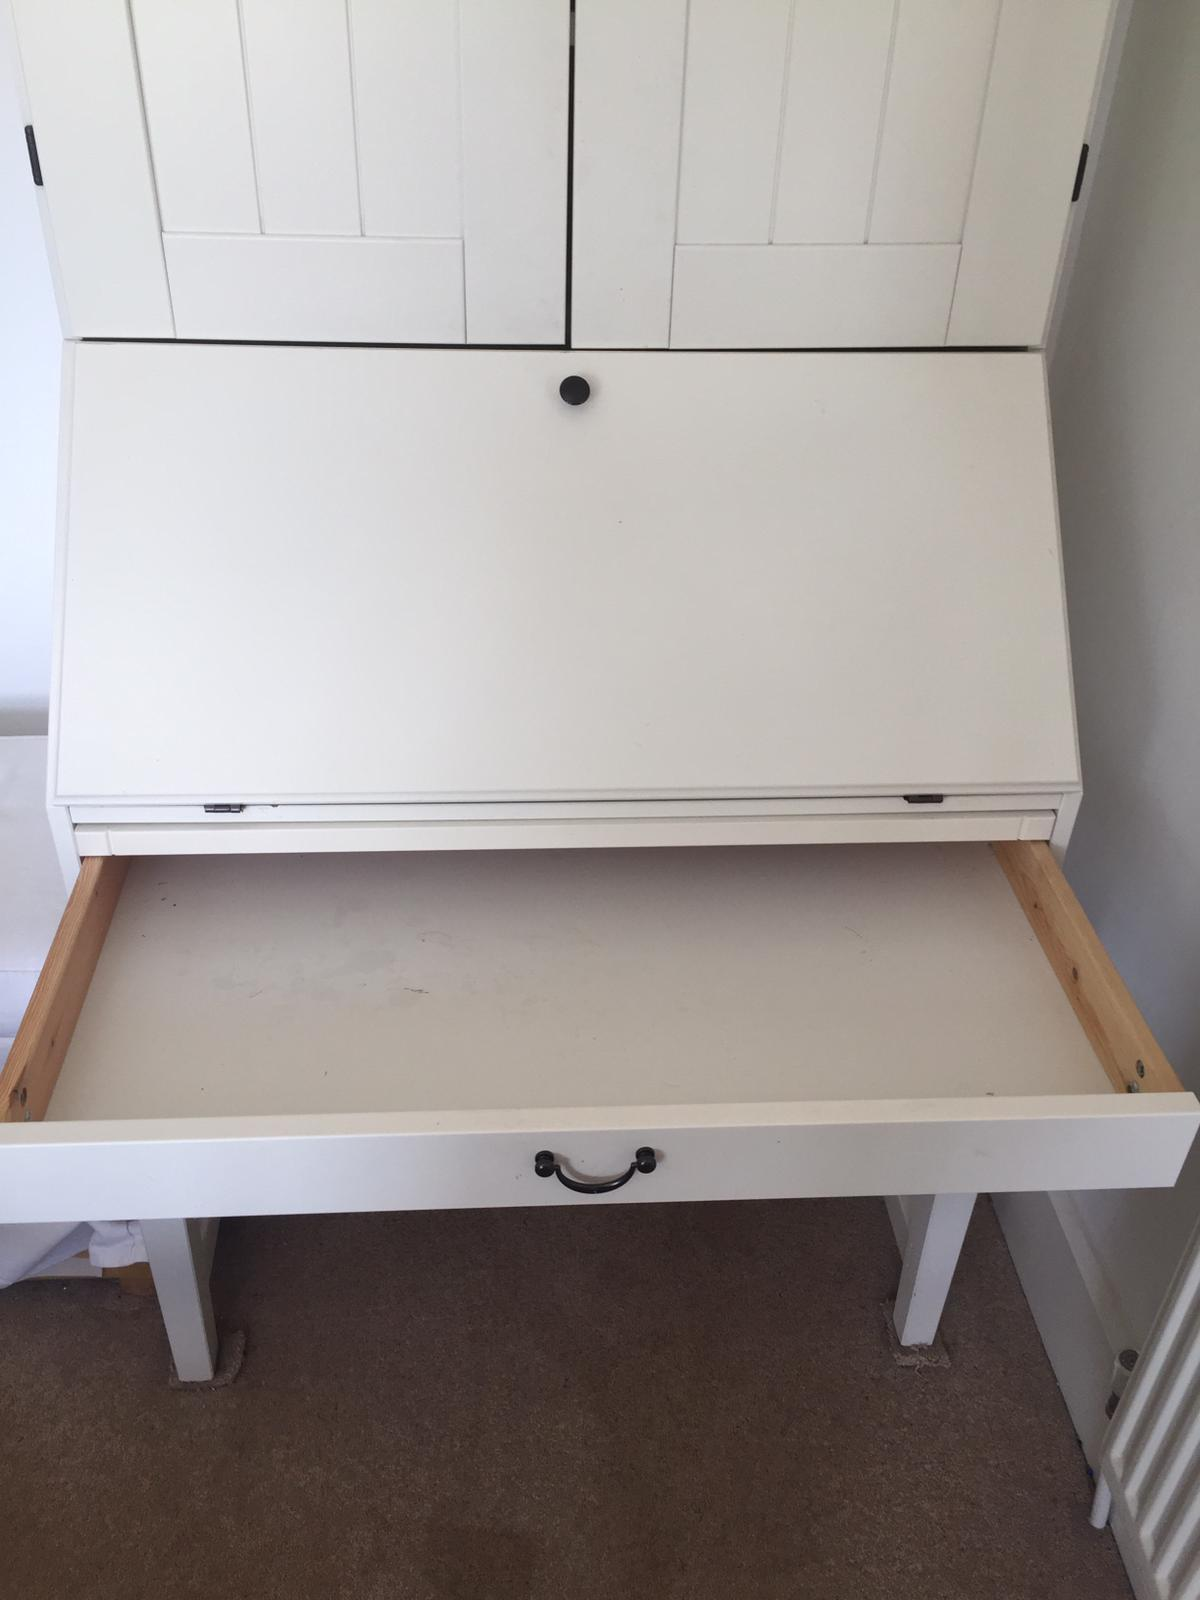 Ikea Alve Bureau Hideaway Desk Cream In Bath Sold Friday Ad